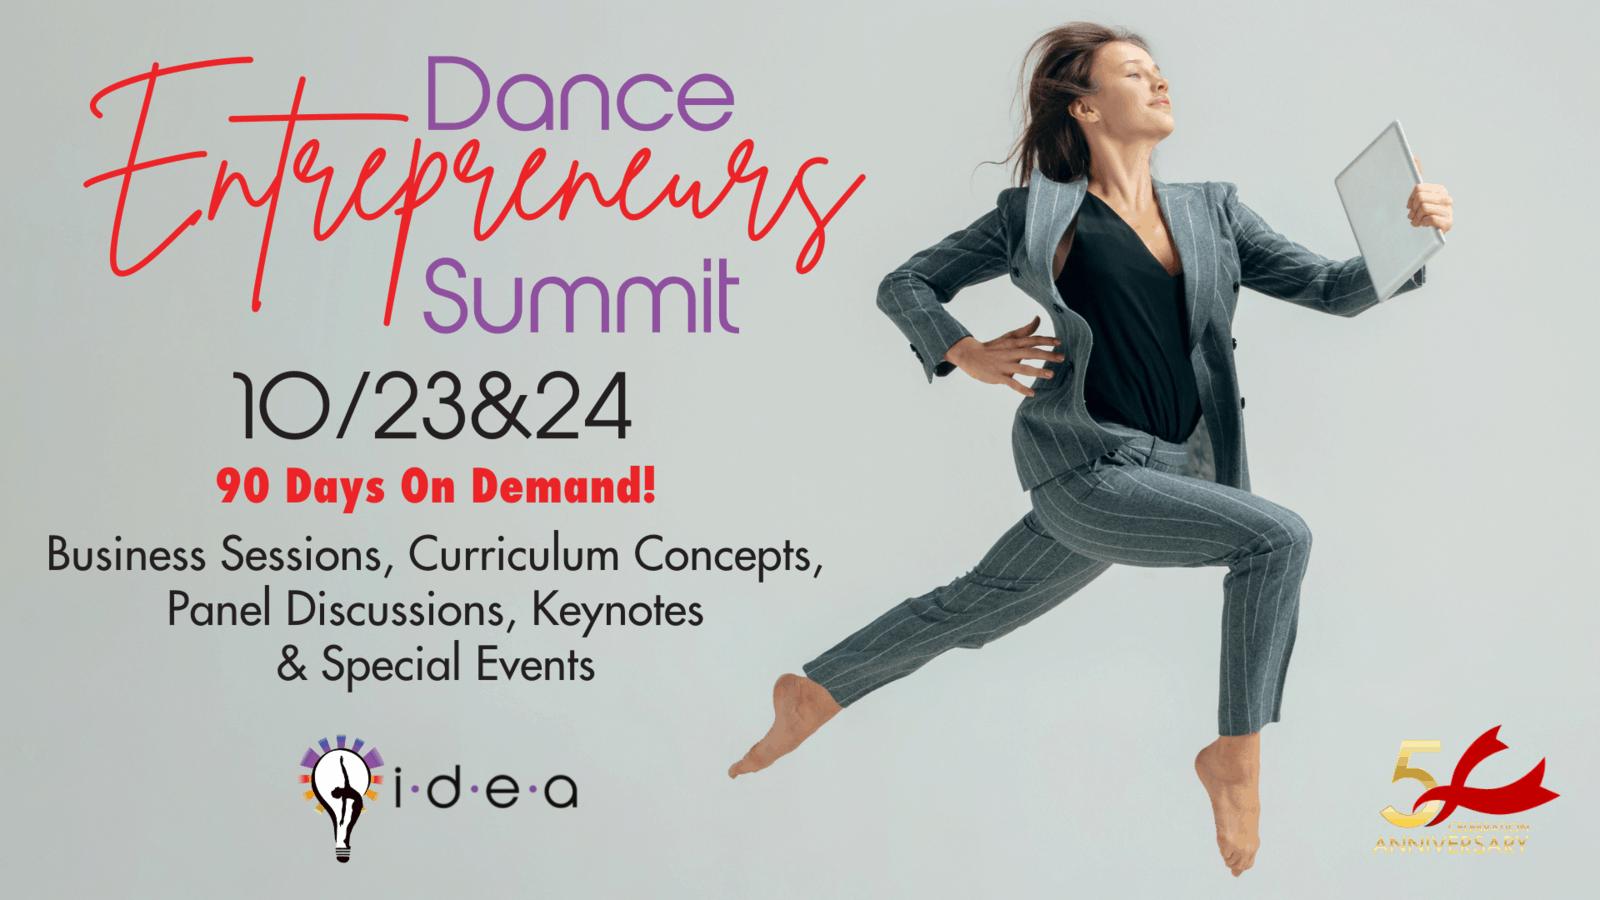 IDEA Dance Entrepreneurs Summit (2)